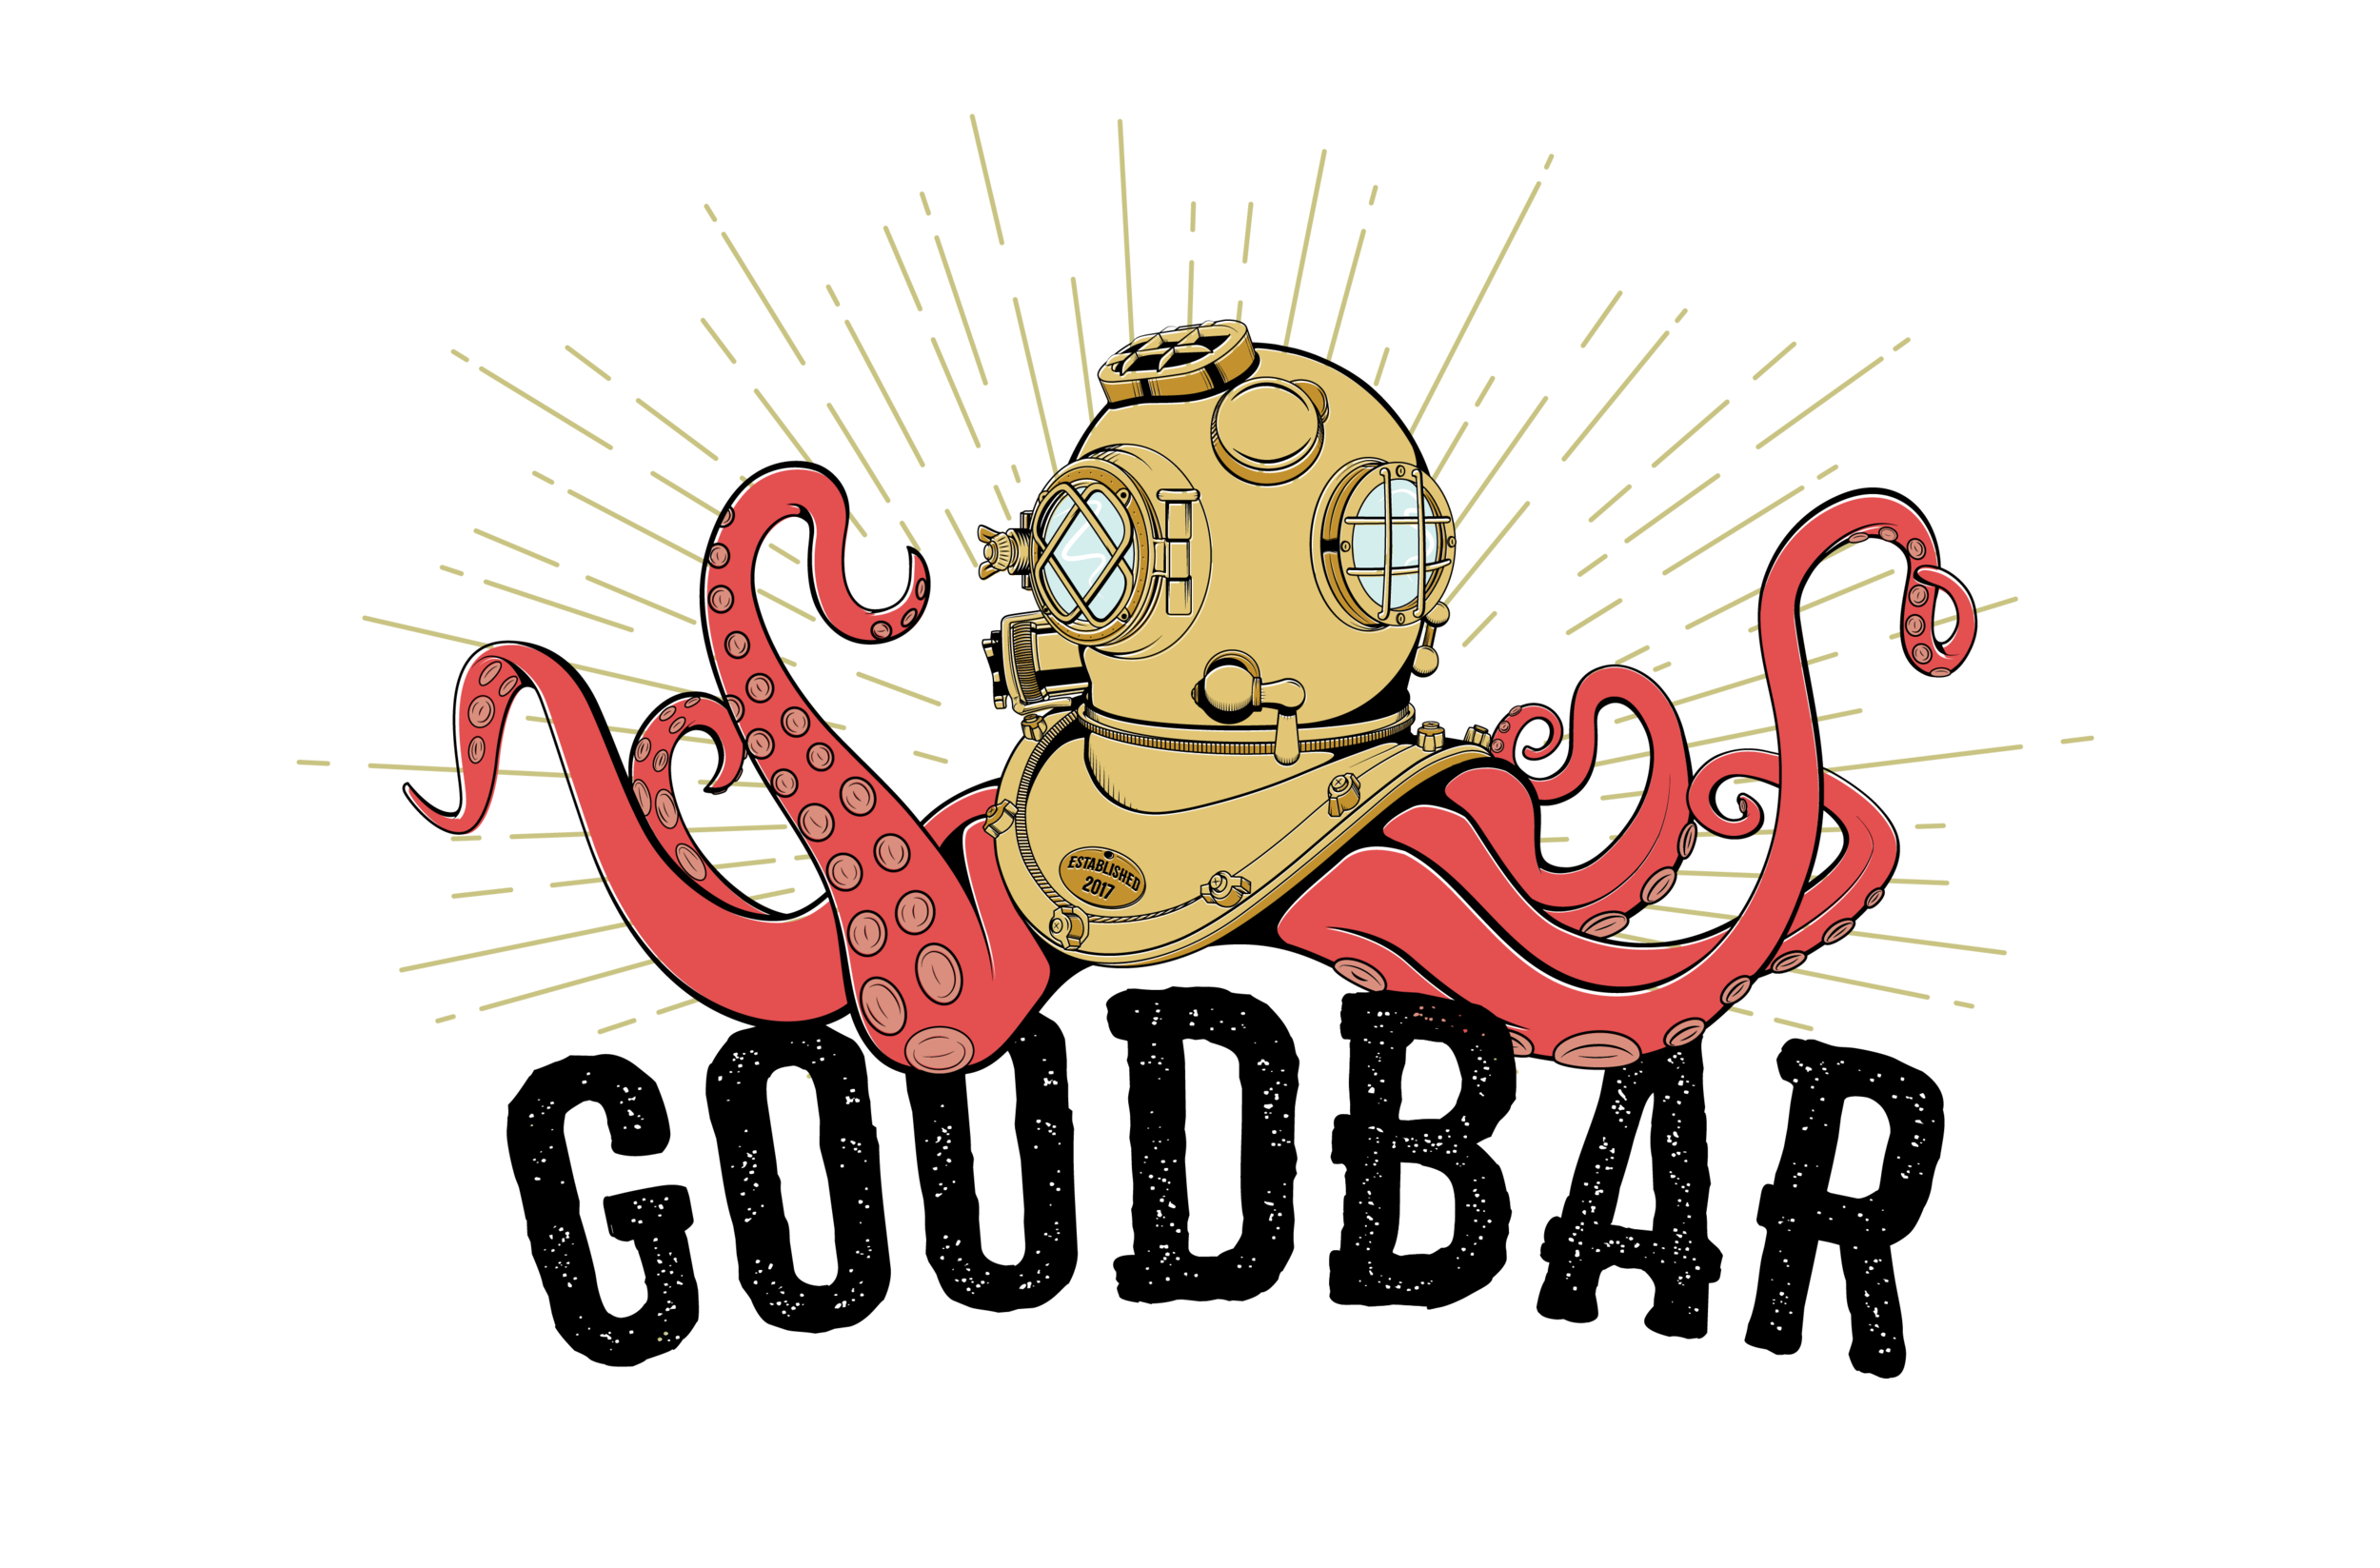 Goodbar-logo.png